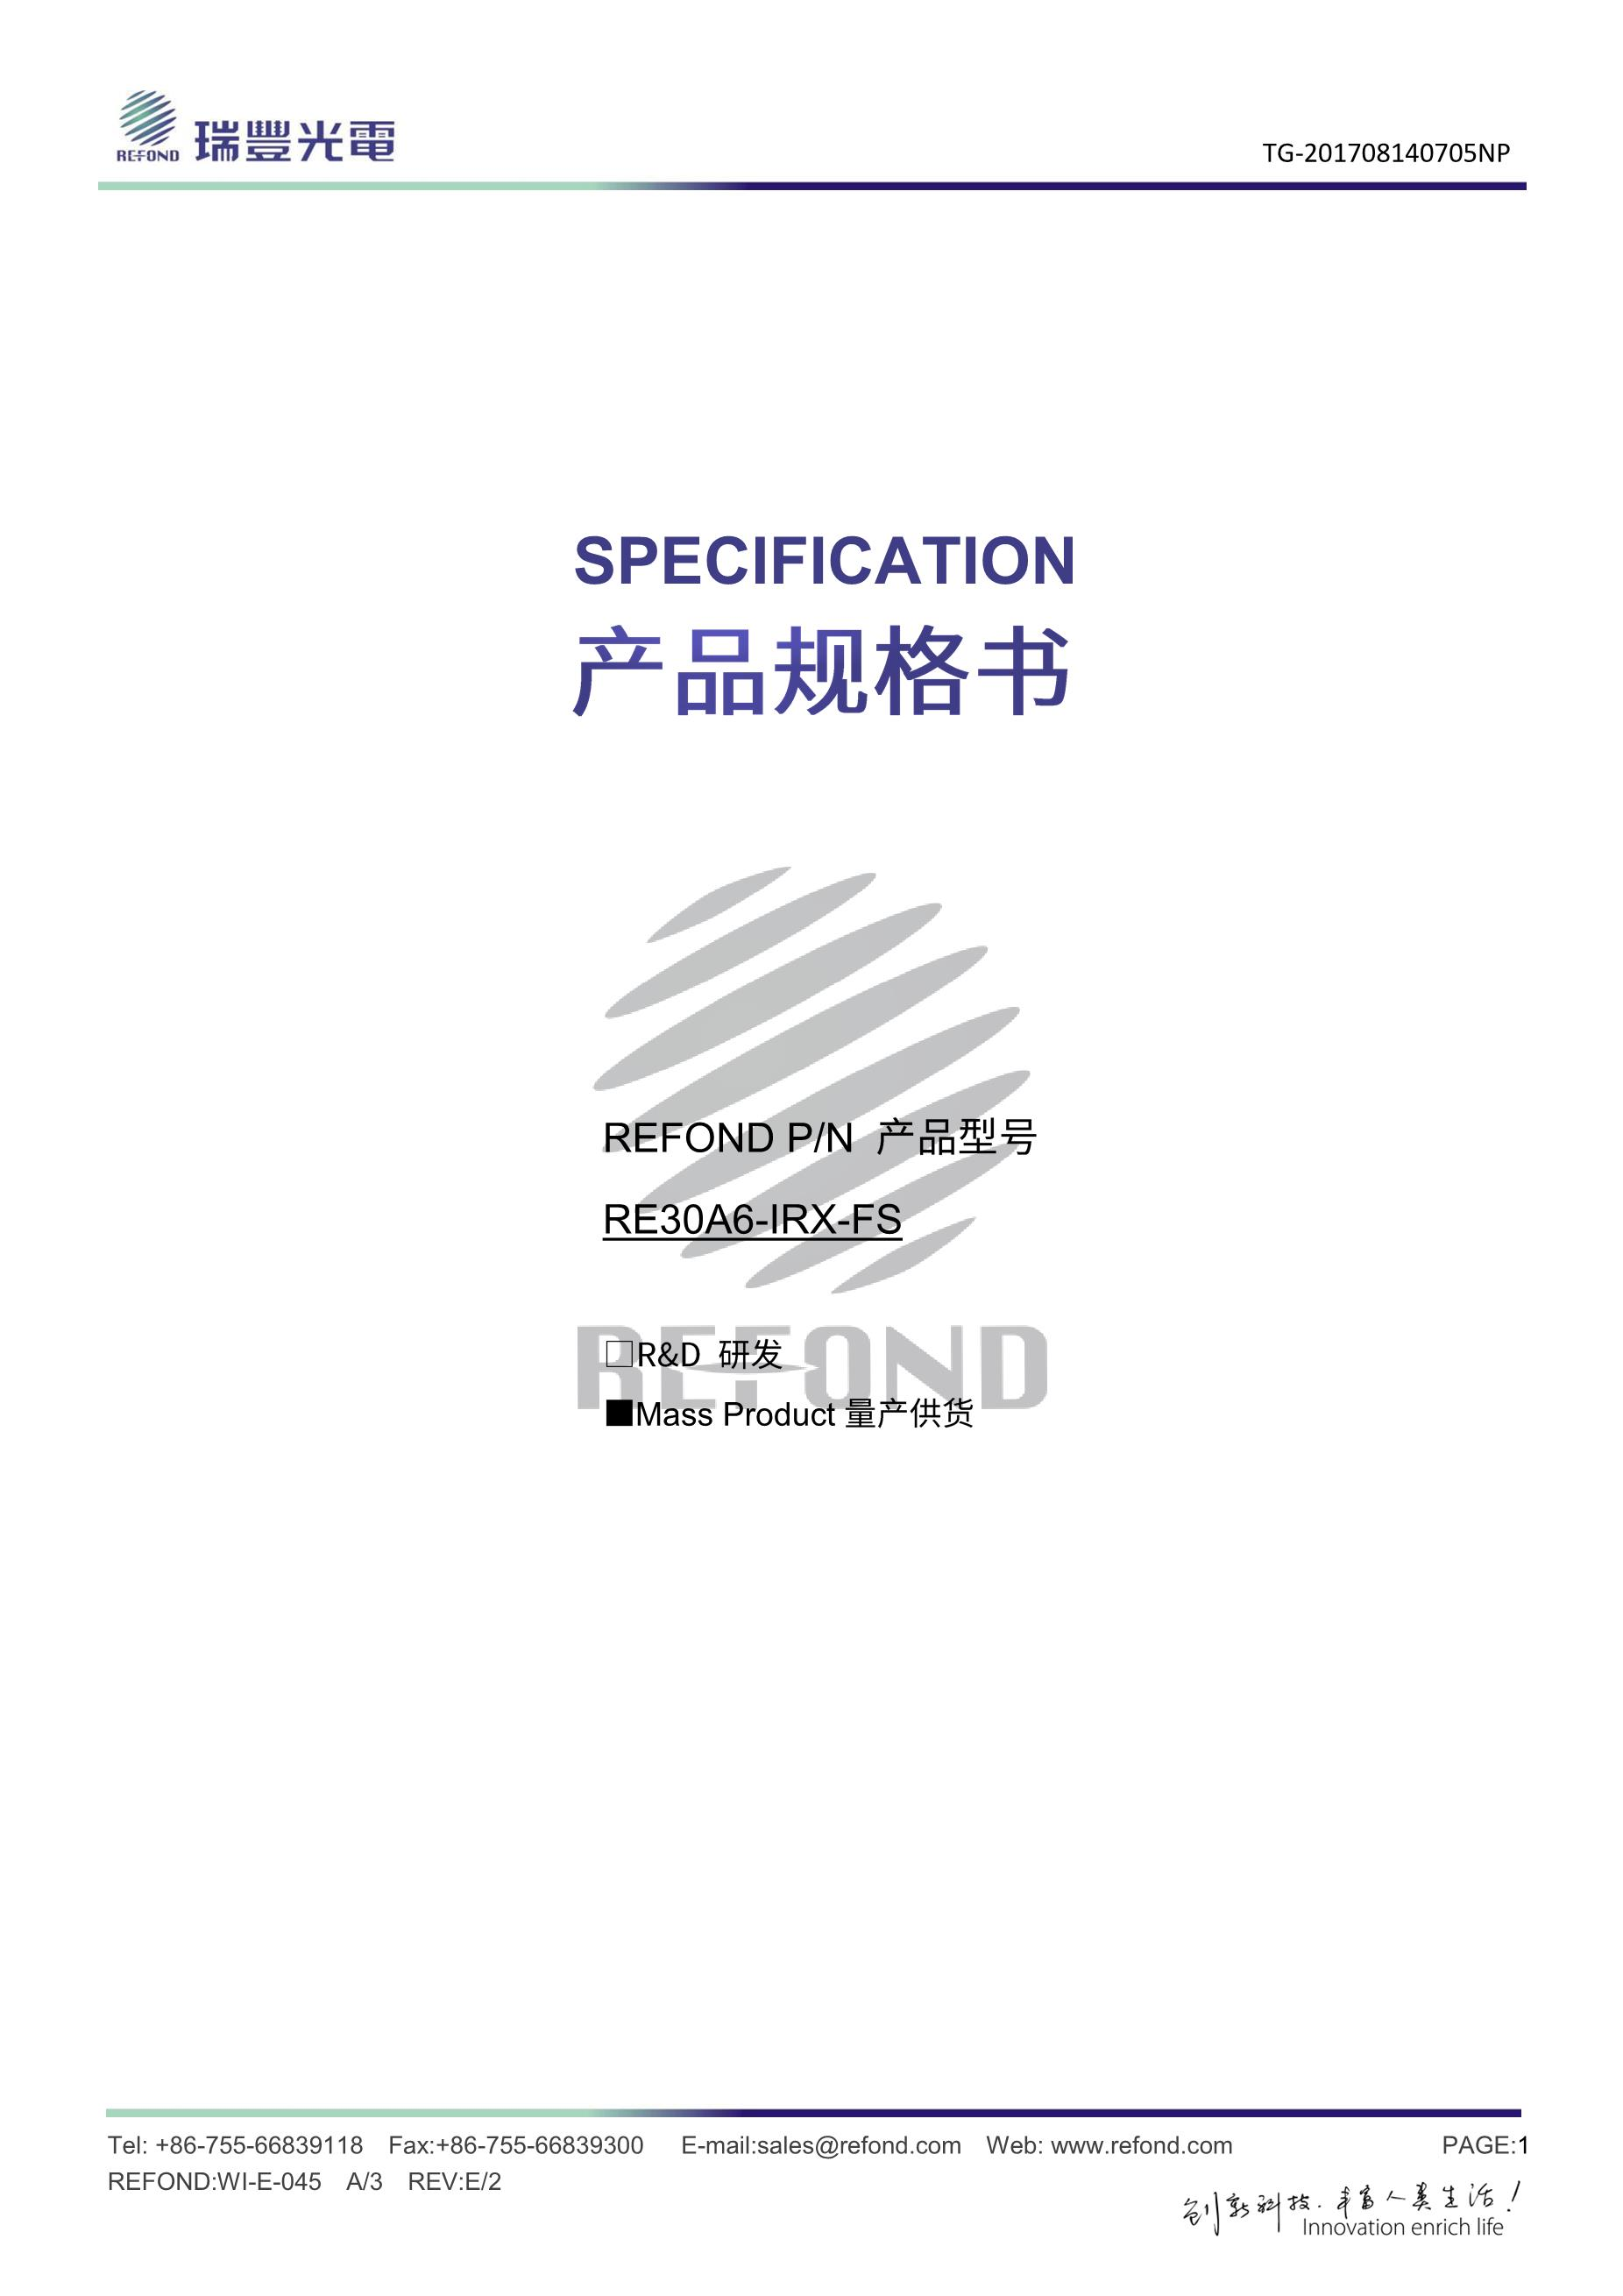 1.8V converter seat SPI Flash memory SOP8 DIP8 converter plate motherboard MX25 W25 1.8V converter board's pdf picture 1